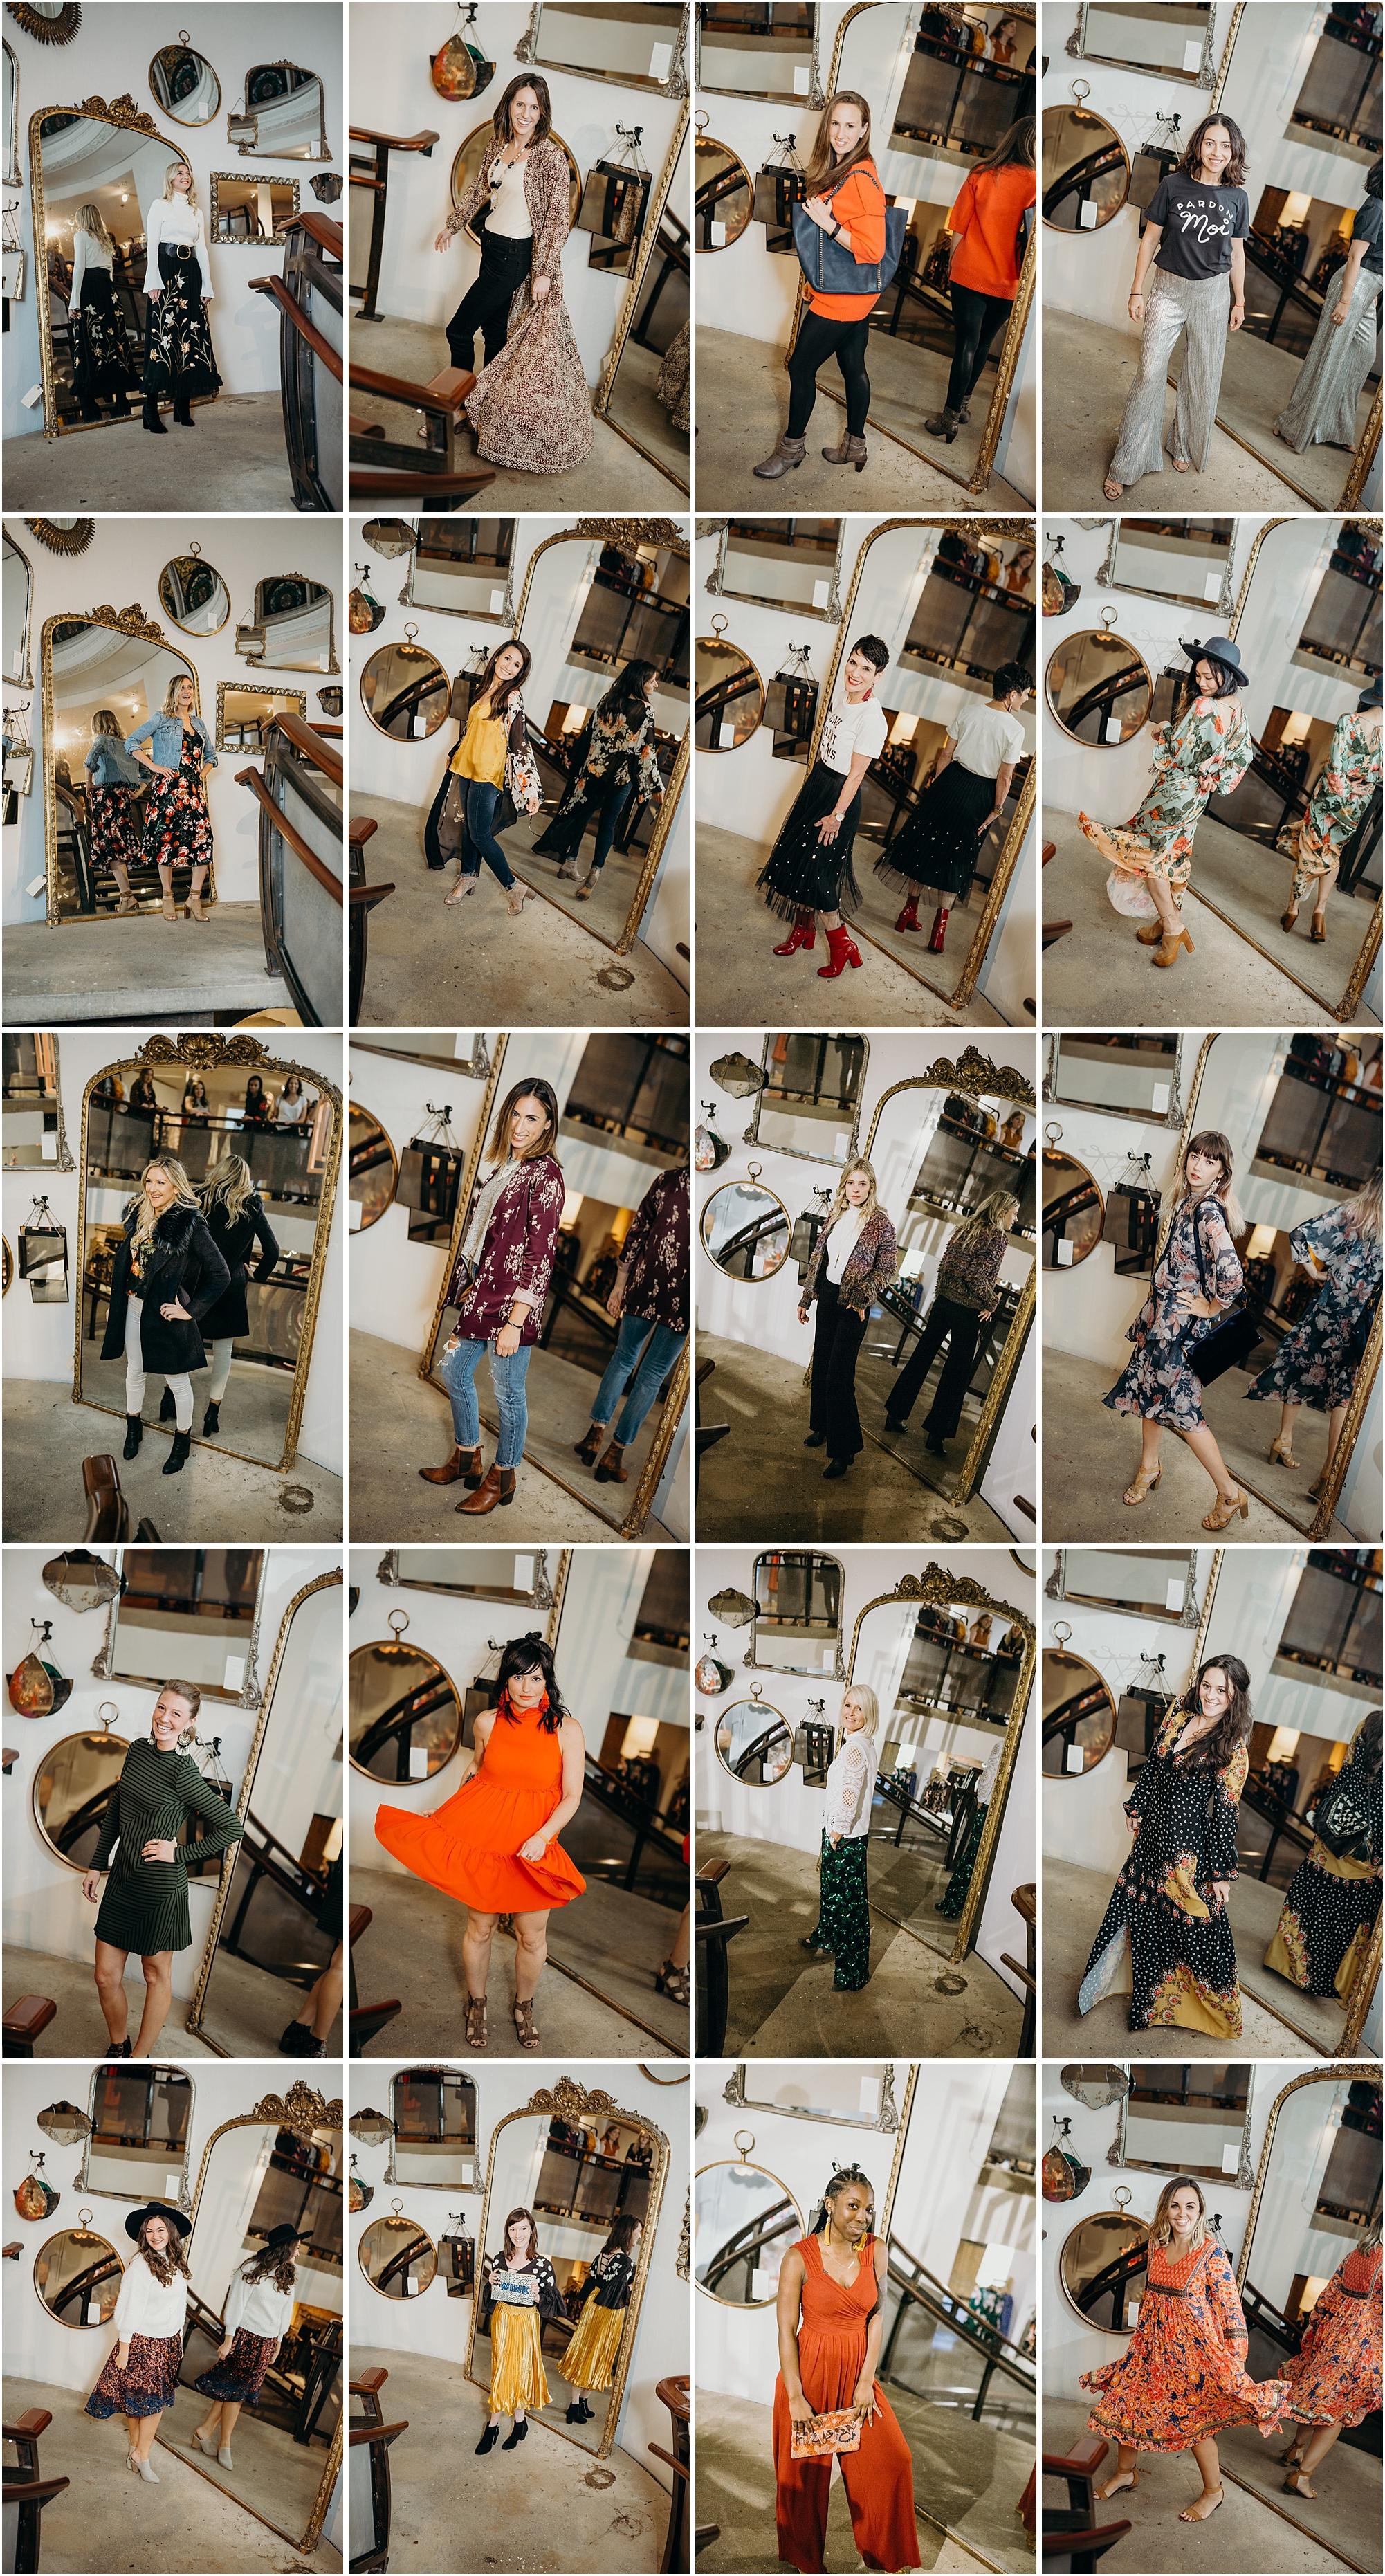 Joe_Mac_Creative_Philadelphia_Photograhy_Anthropologie_Fall_Fashion_0008.jpg